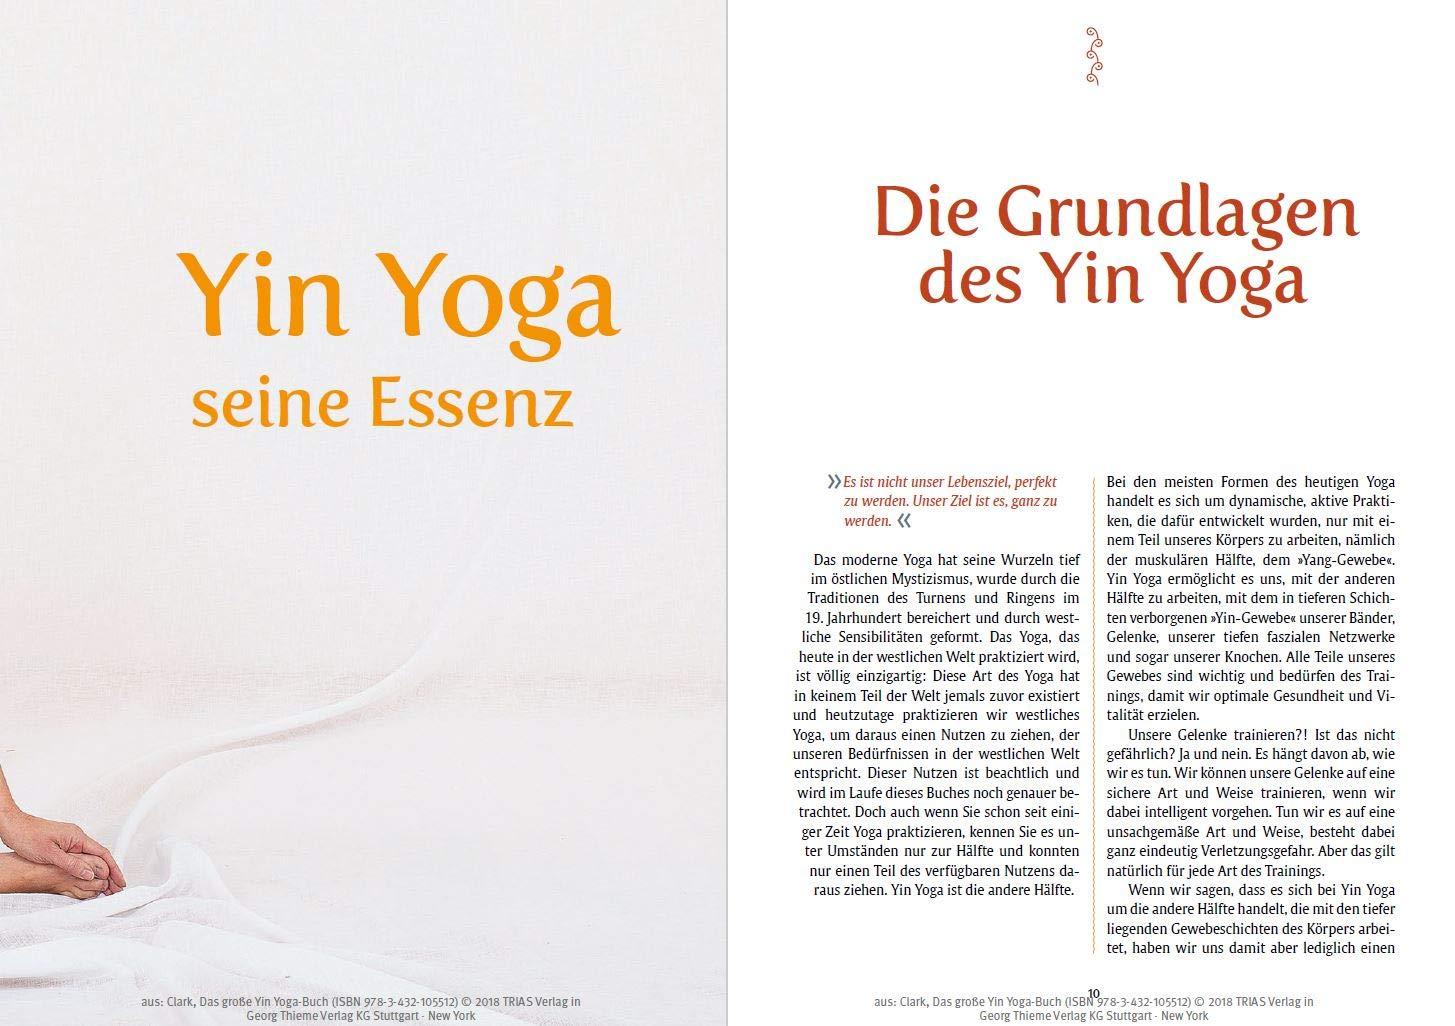 Das Grosse Yin Yoga Buch Clark Bernie Meyer Nicole Amazon De Bucher